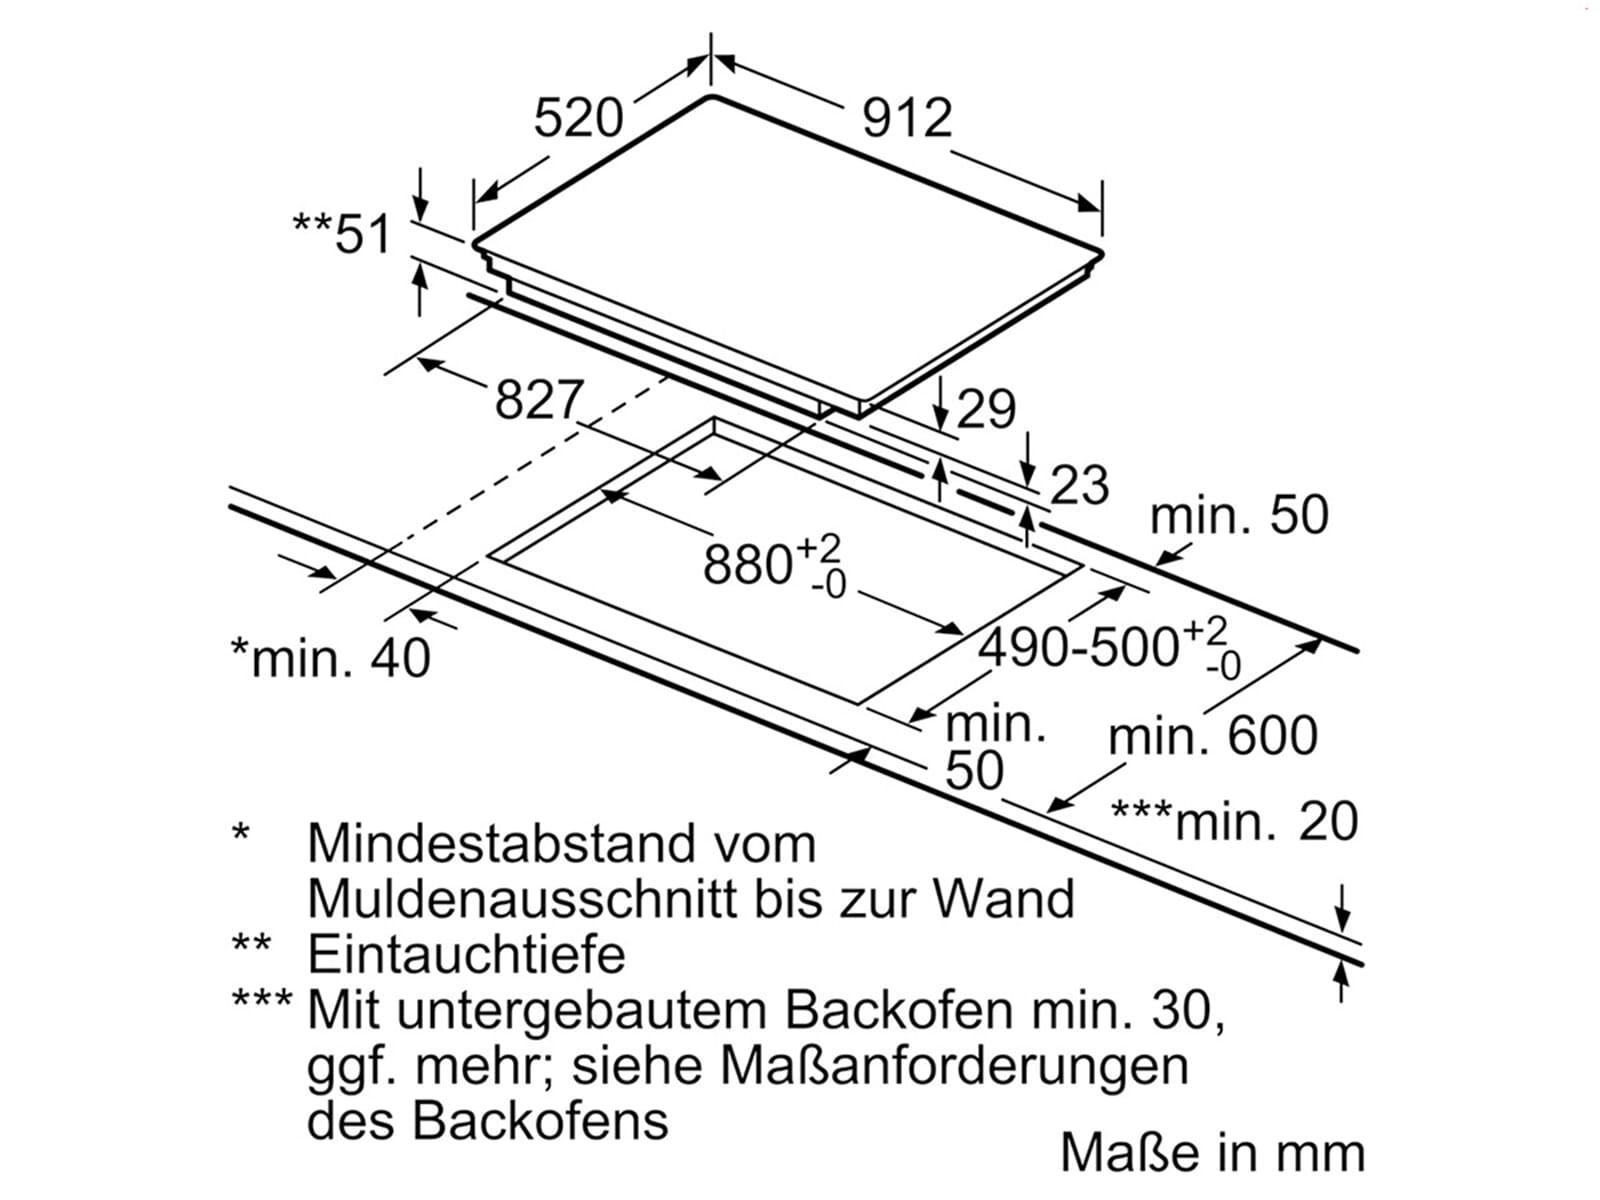 Siemens HB674GBS1 Pyrolyse Backofen Edelstahl + EX975LVV1E Induktionskochfeld